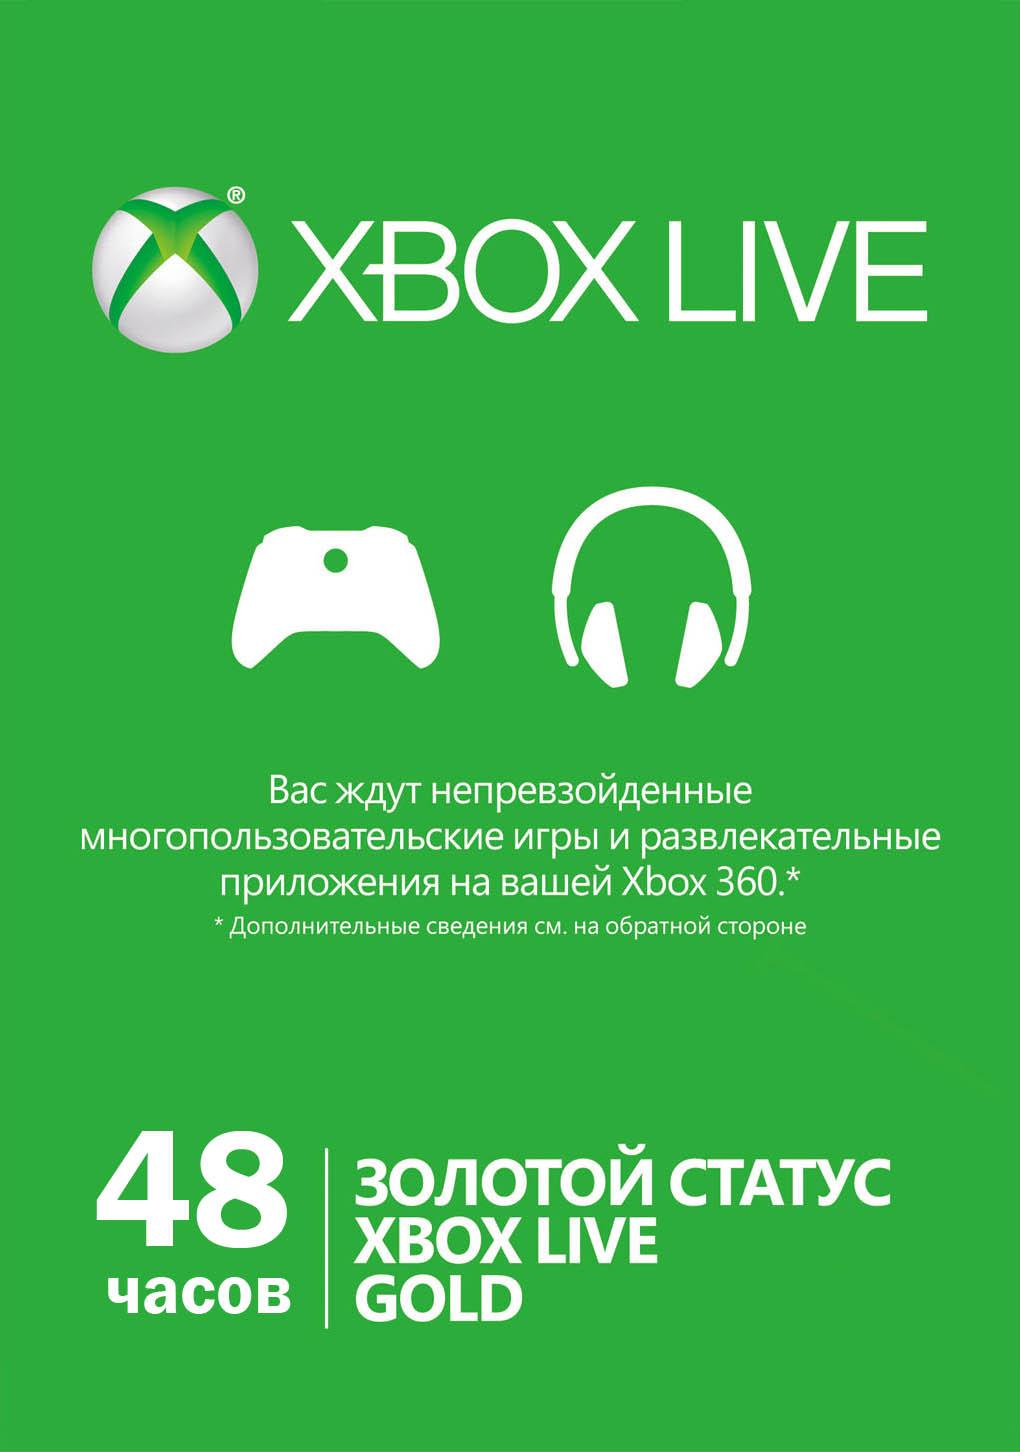 XBox Live Gold 48 hours RU/EU/US (All regions)